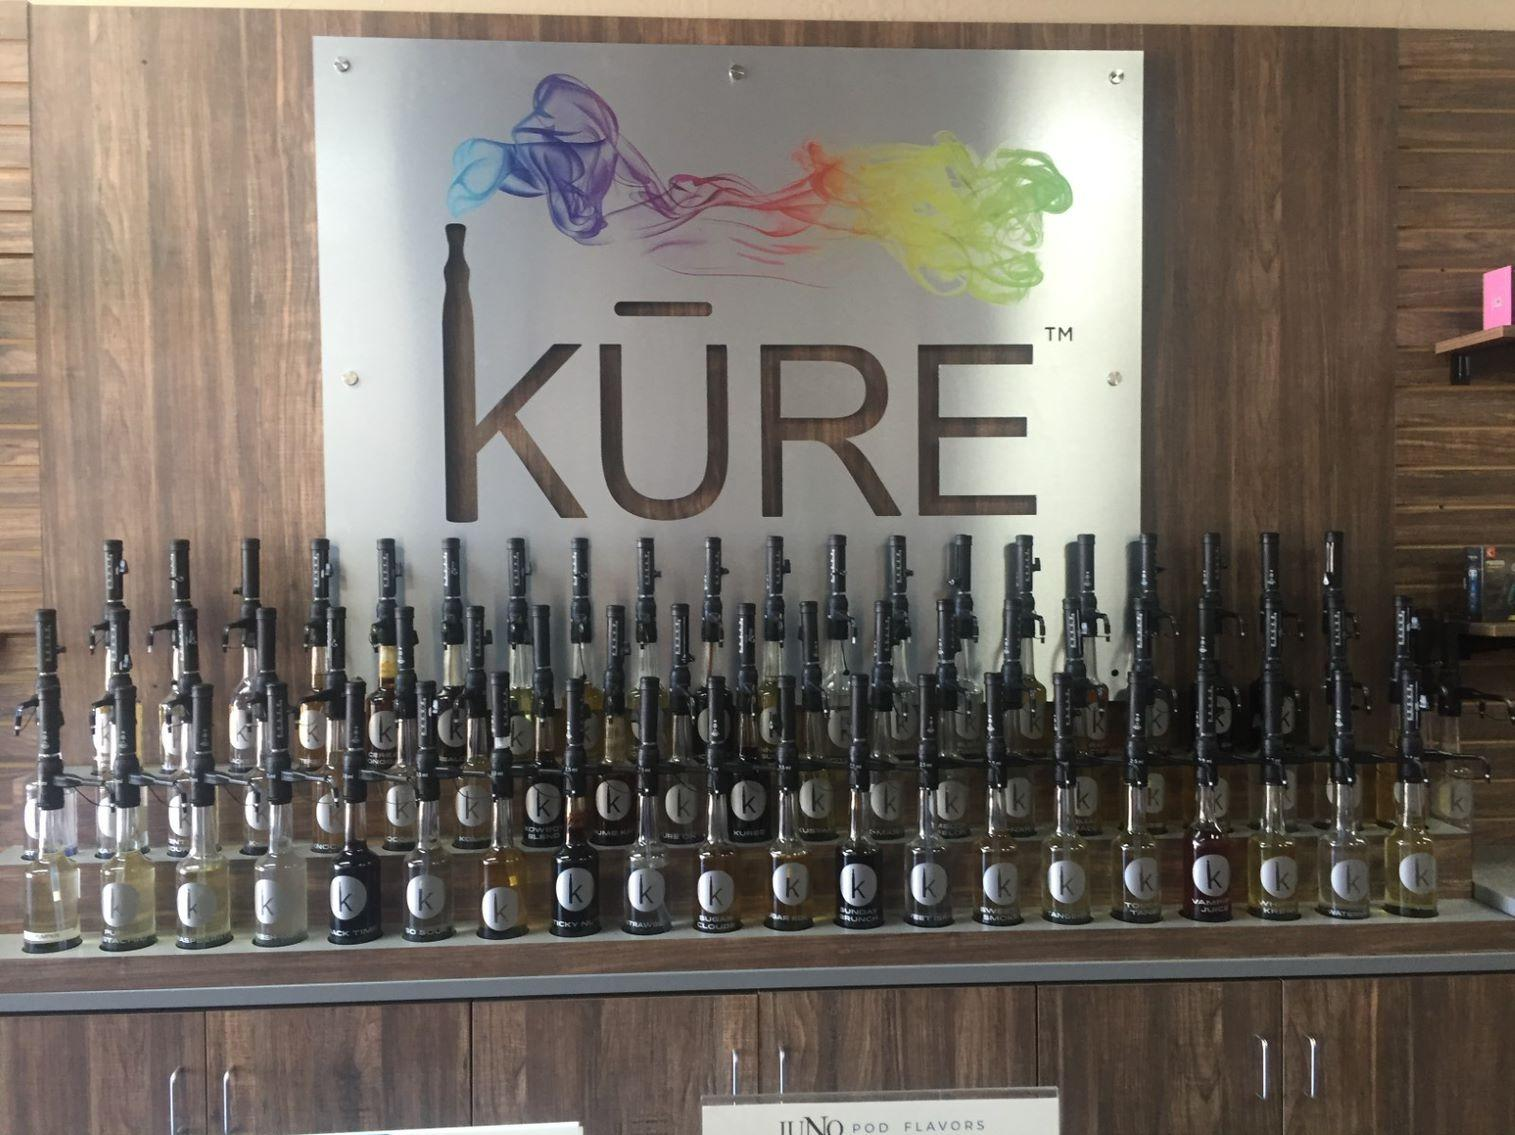 Kure CBD and Vape - Gilbert North